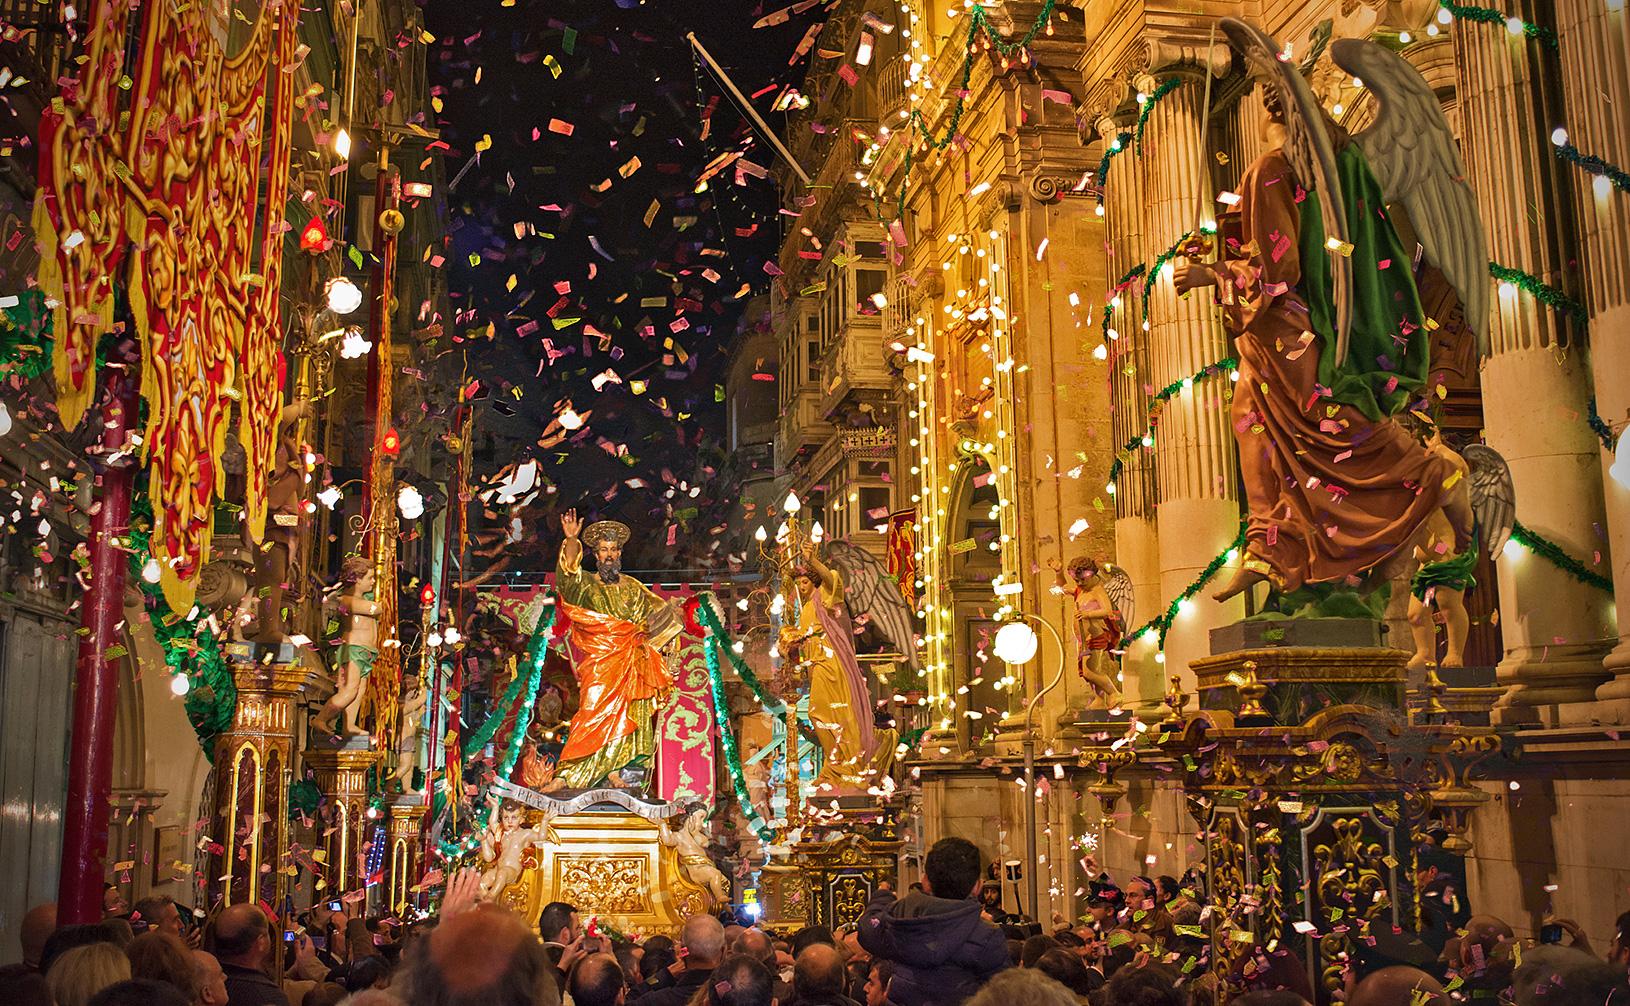 guided tour - St. Paul's feast - Malta